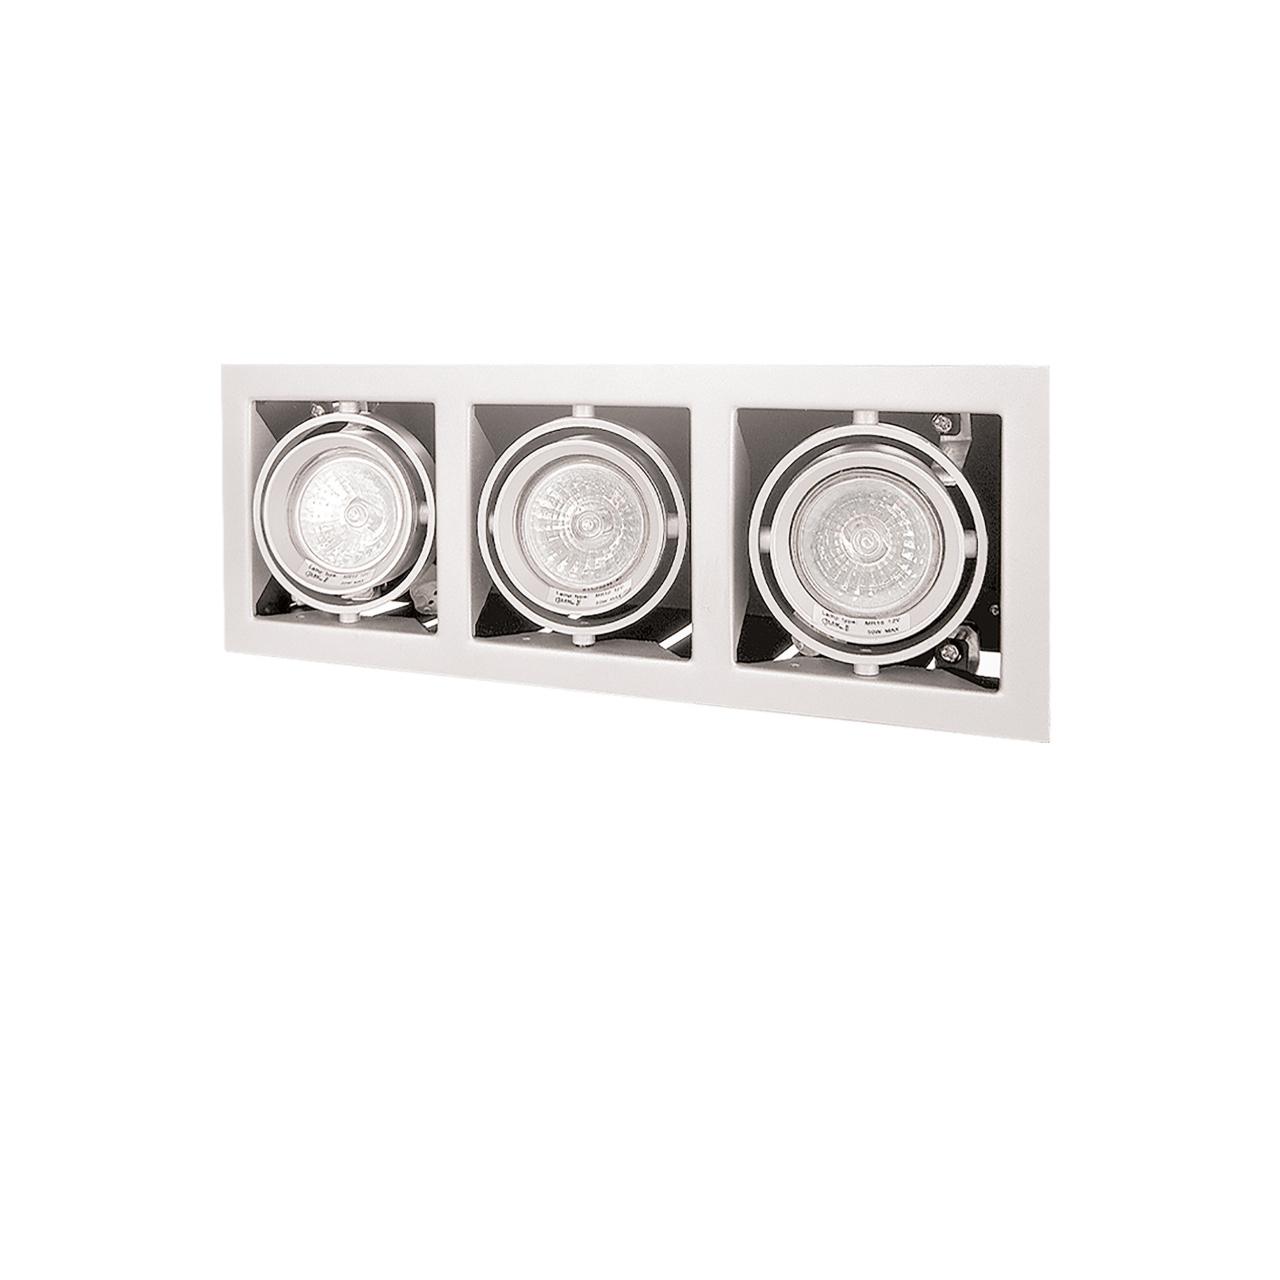 Светильник Cardano 16Х3 MR16 / HP16 белый Lightstar 214030